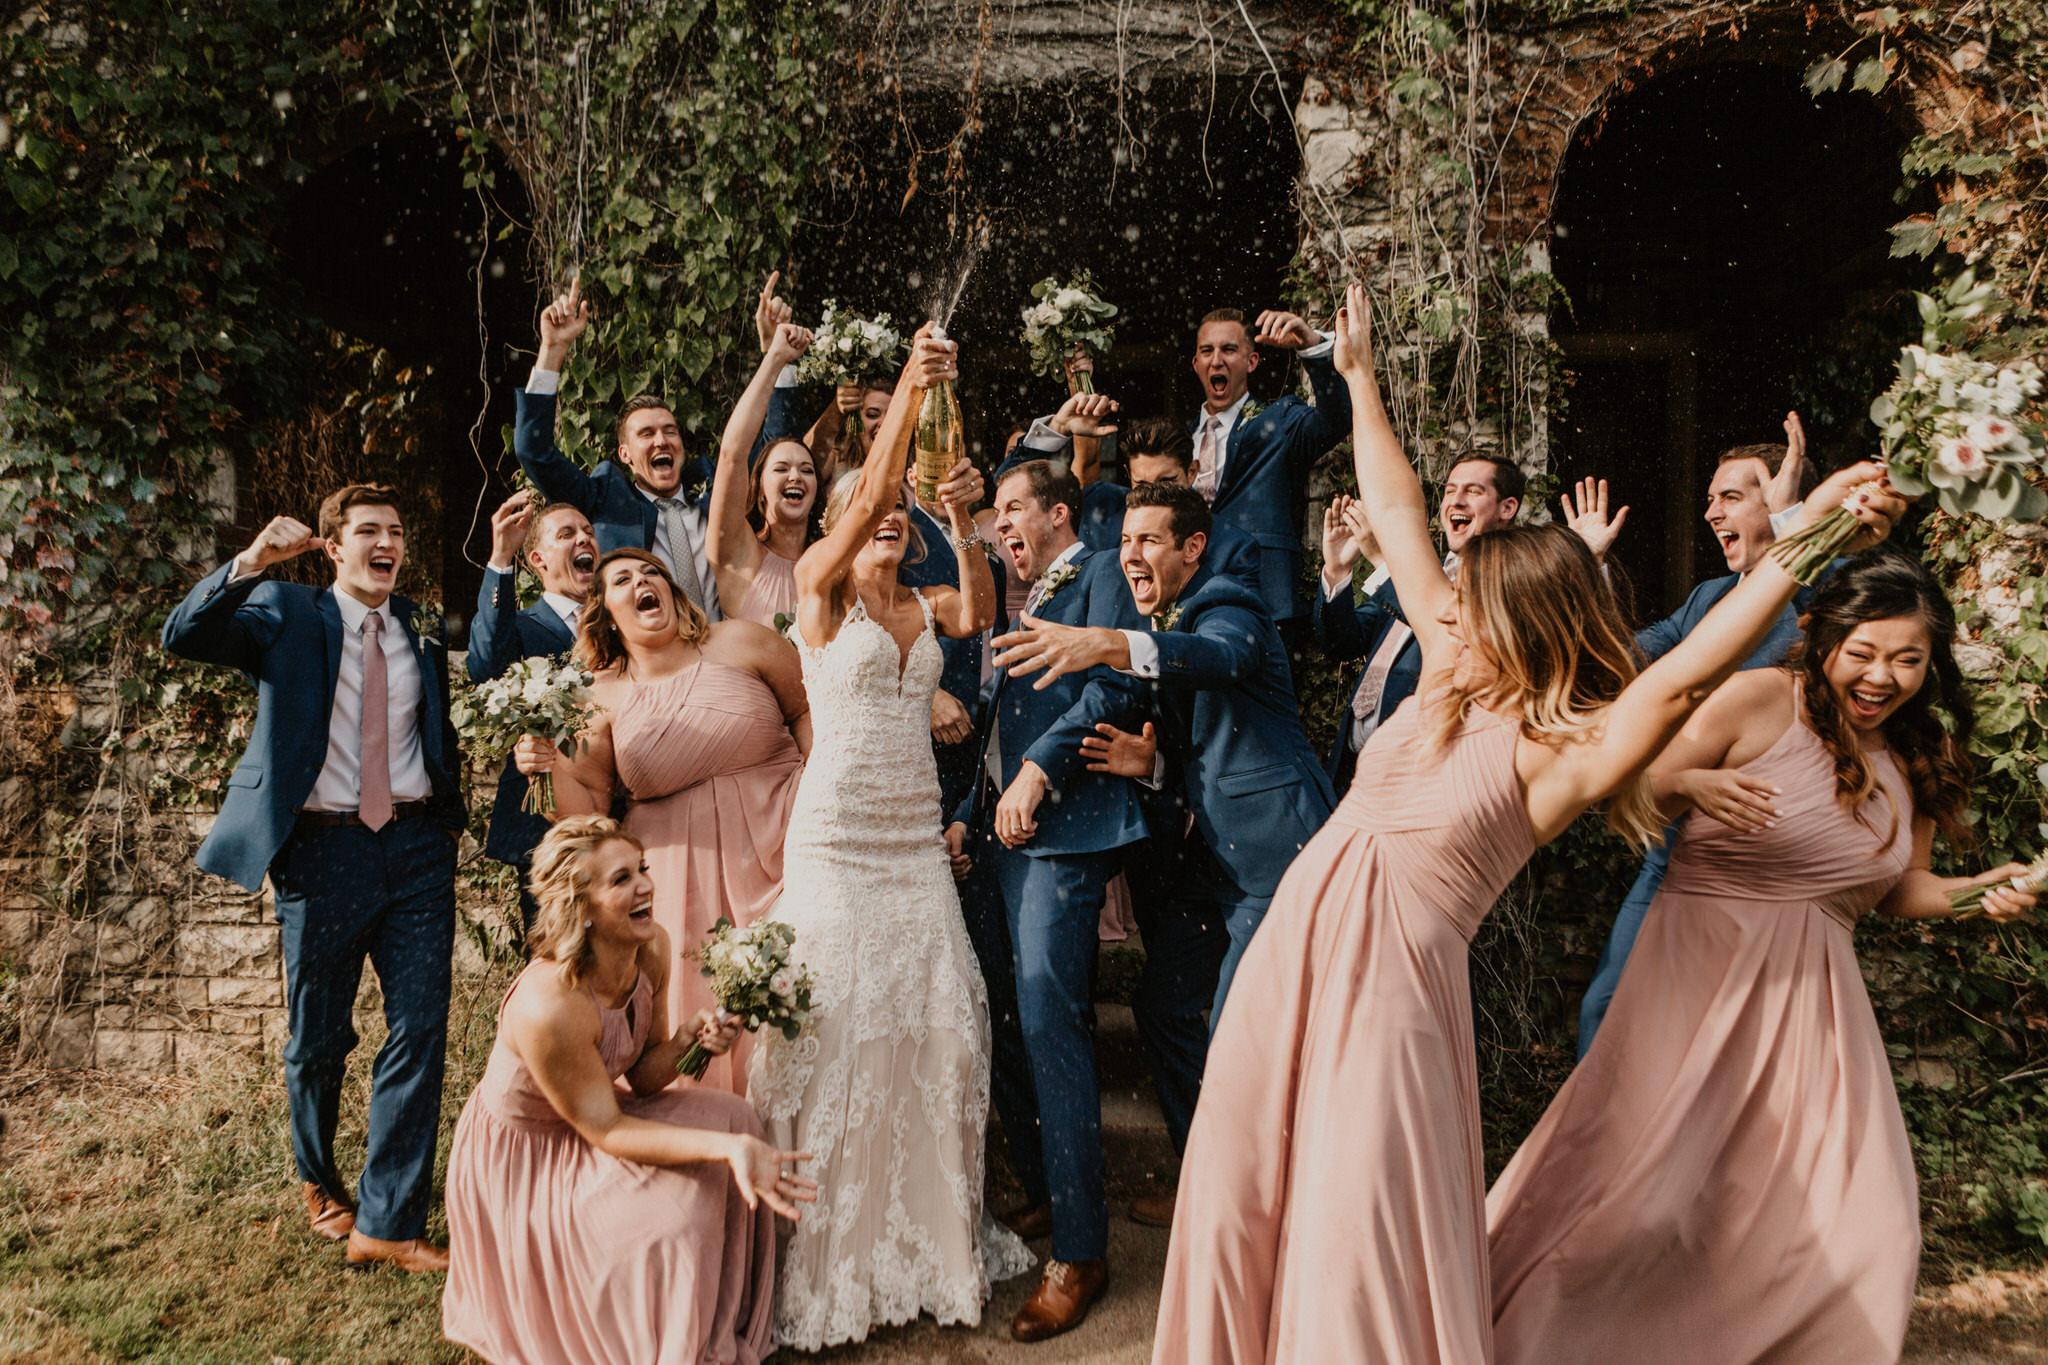 Planning a wedding - Omaha Wedding Photographers.jpg